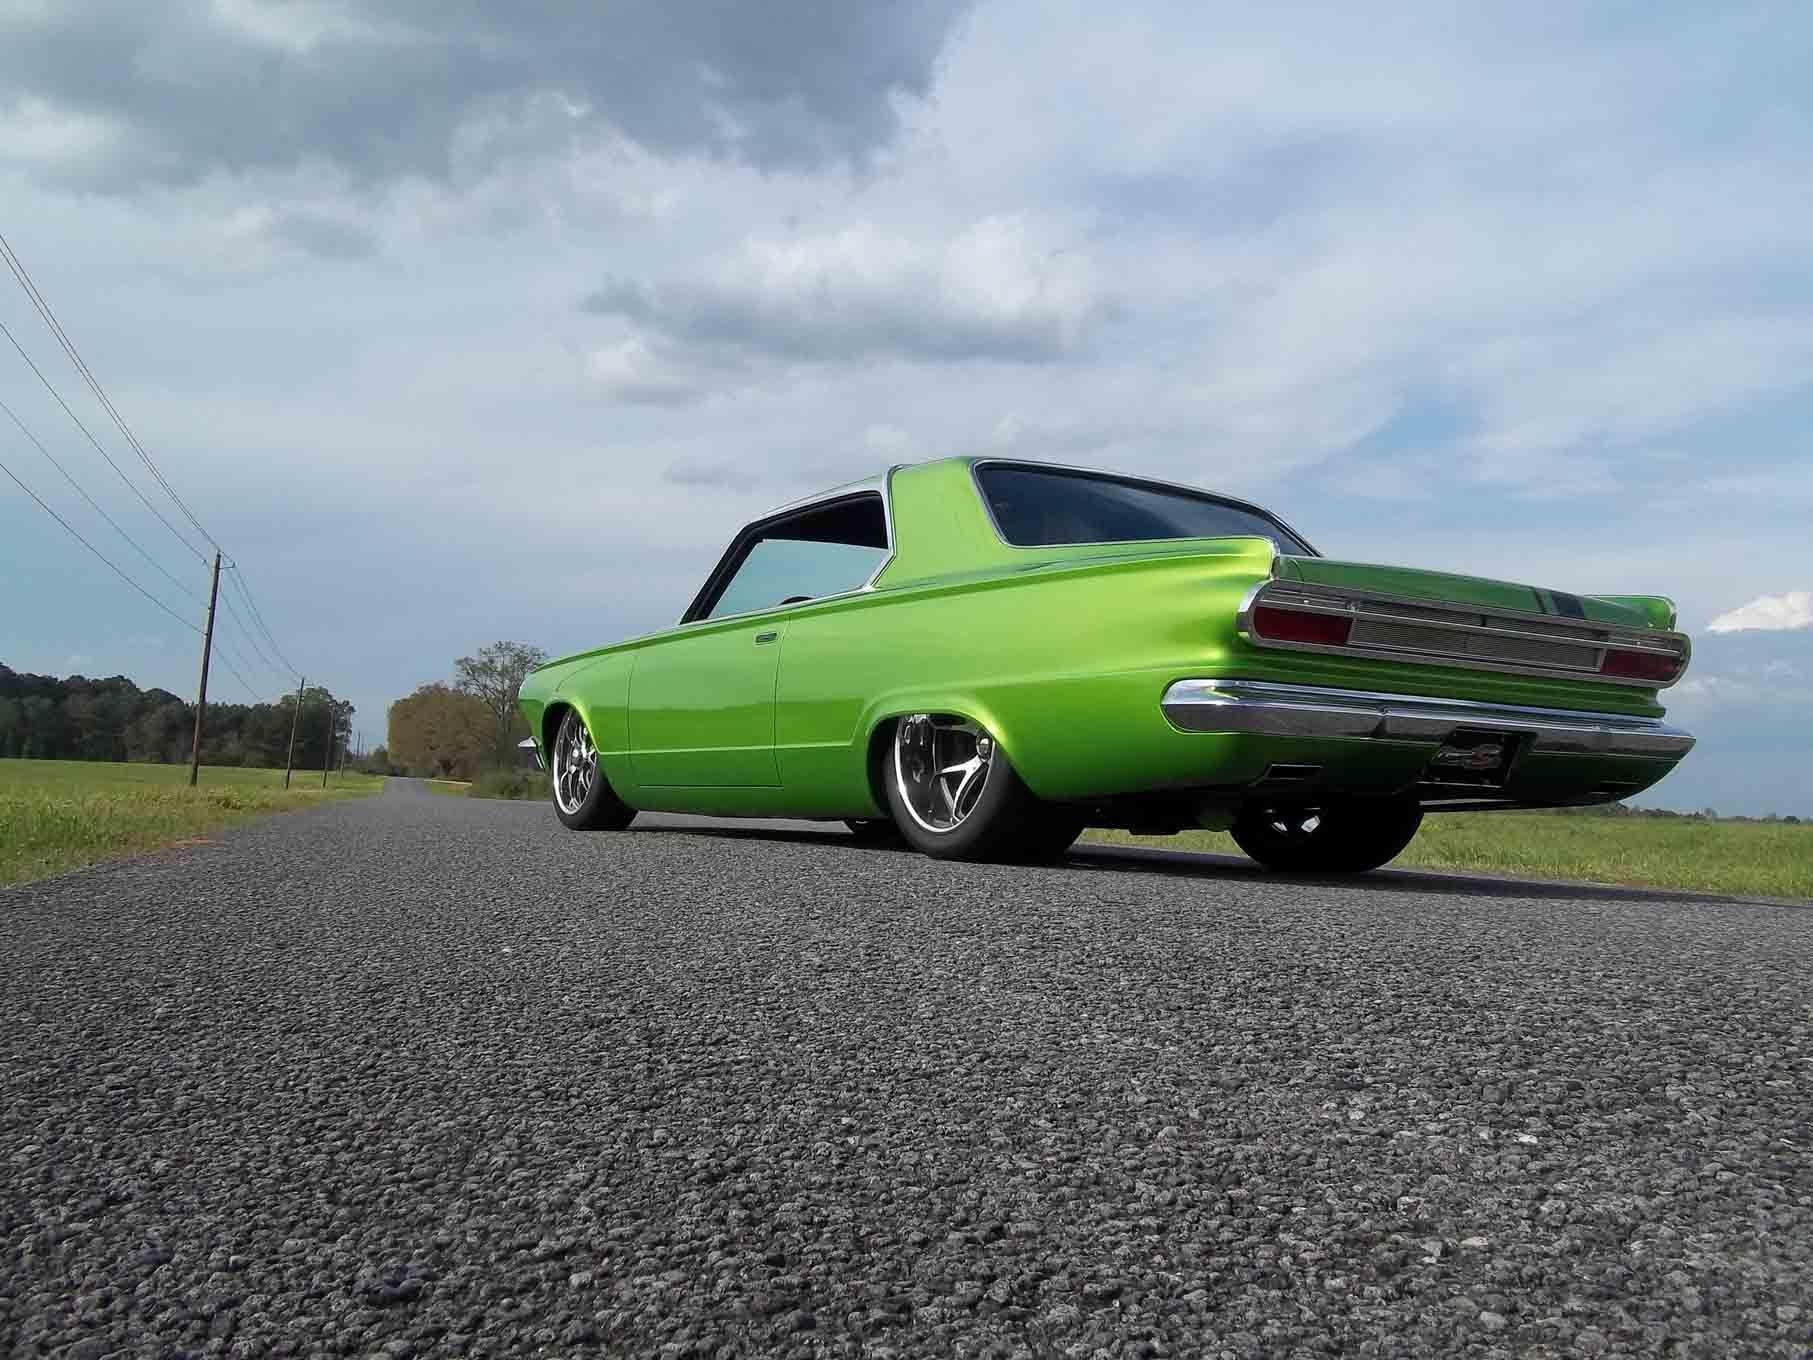 1965 dodge dart coupe hardtop street machine pro touring green usa 15 wallpaper 1813x1360 761608 wallpaperup